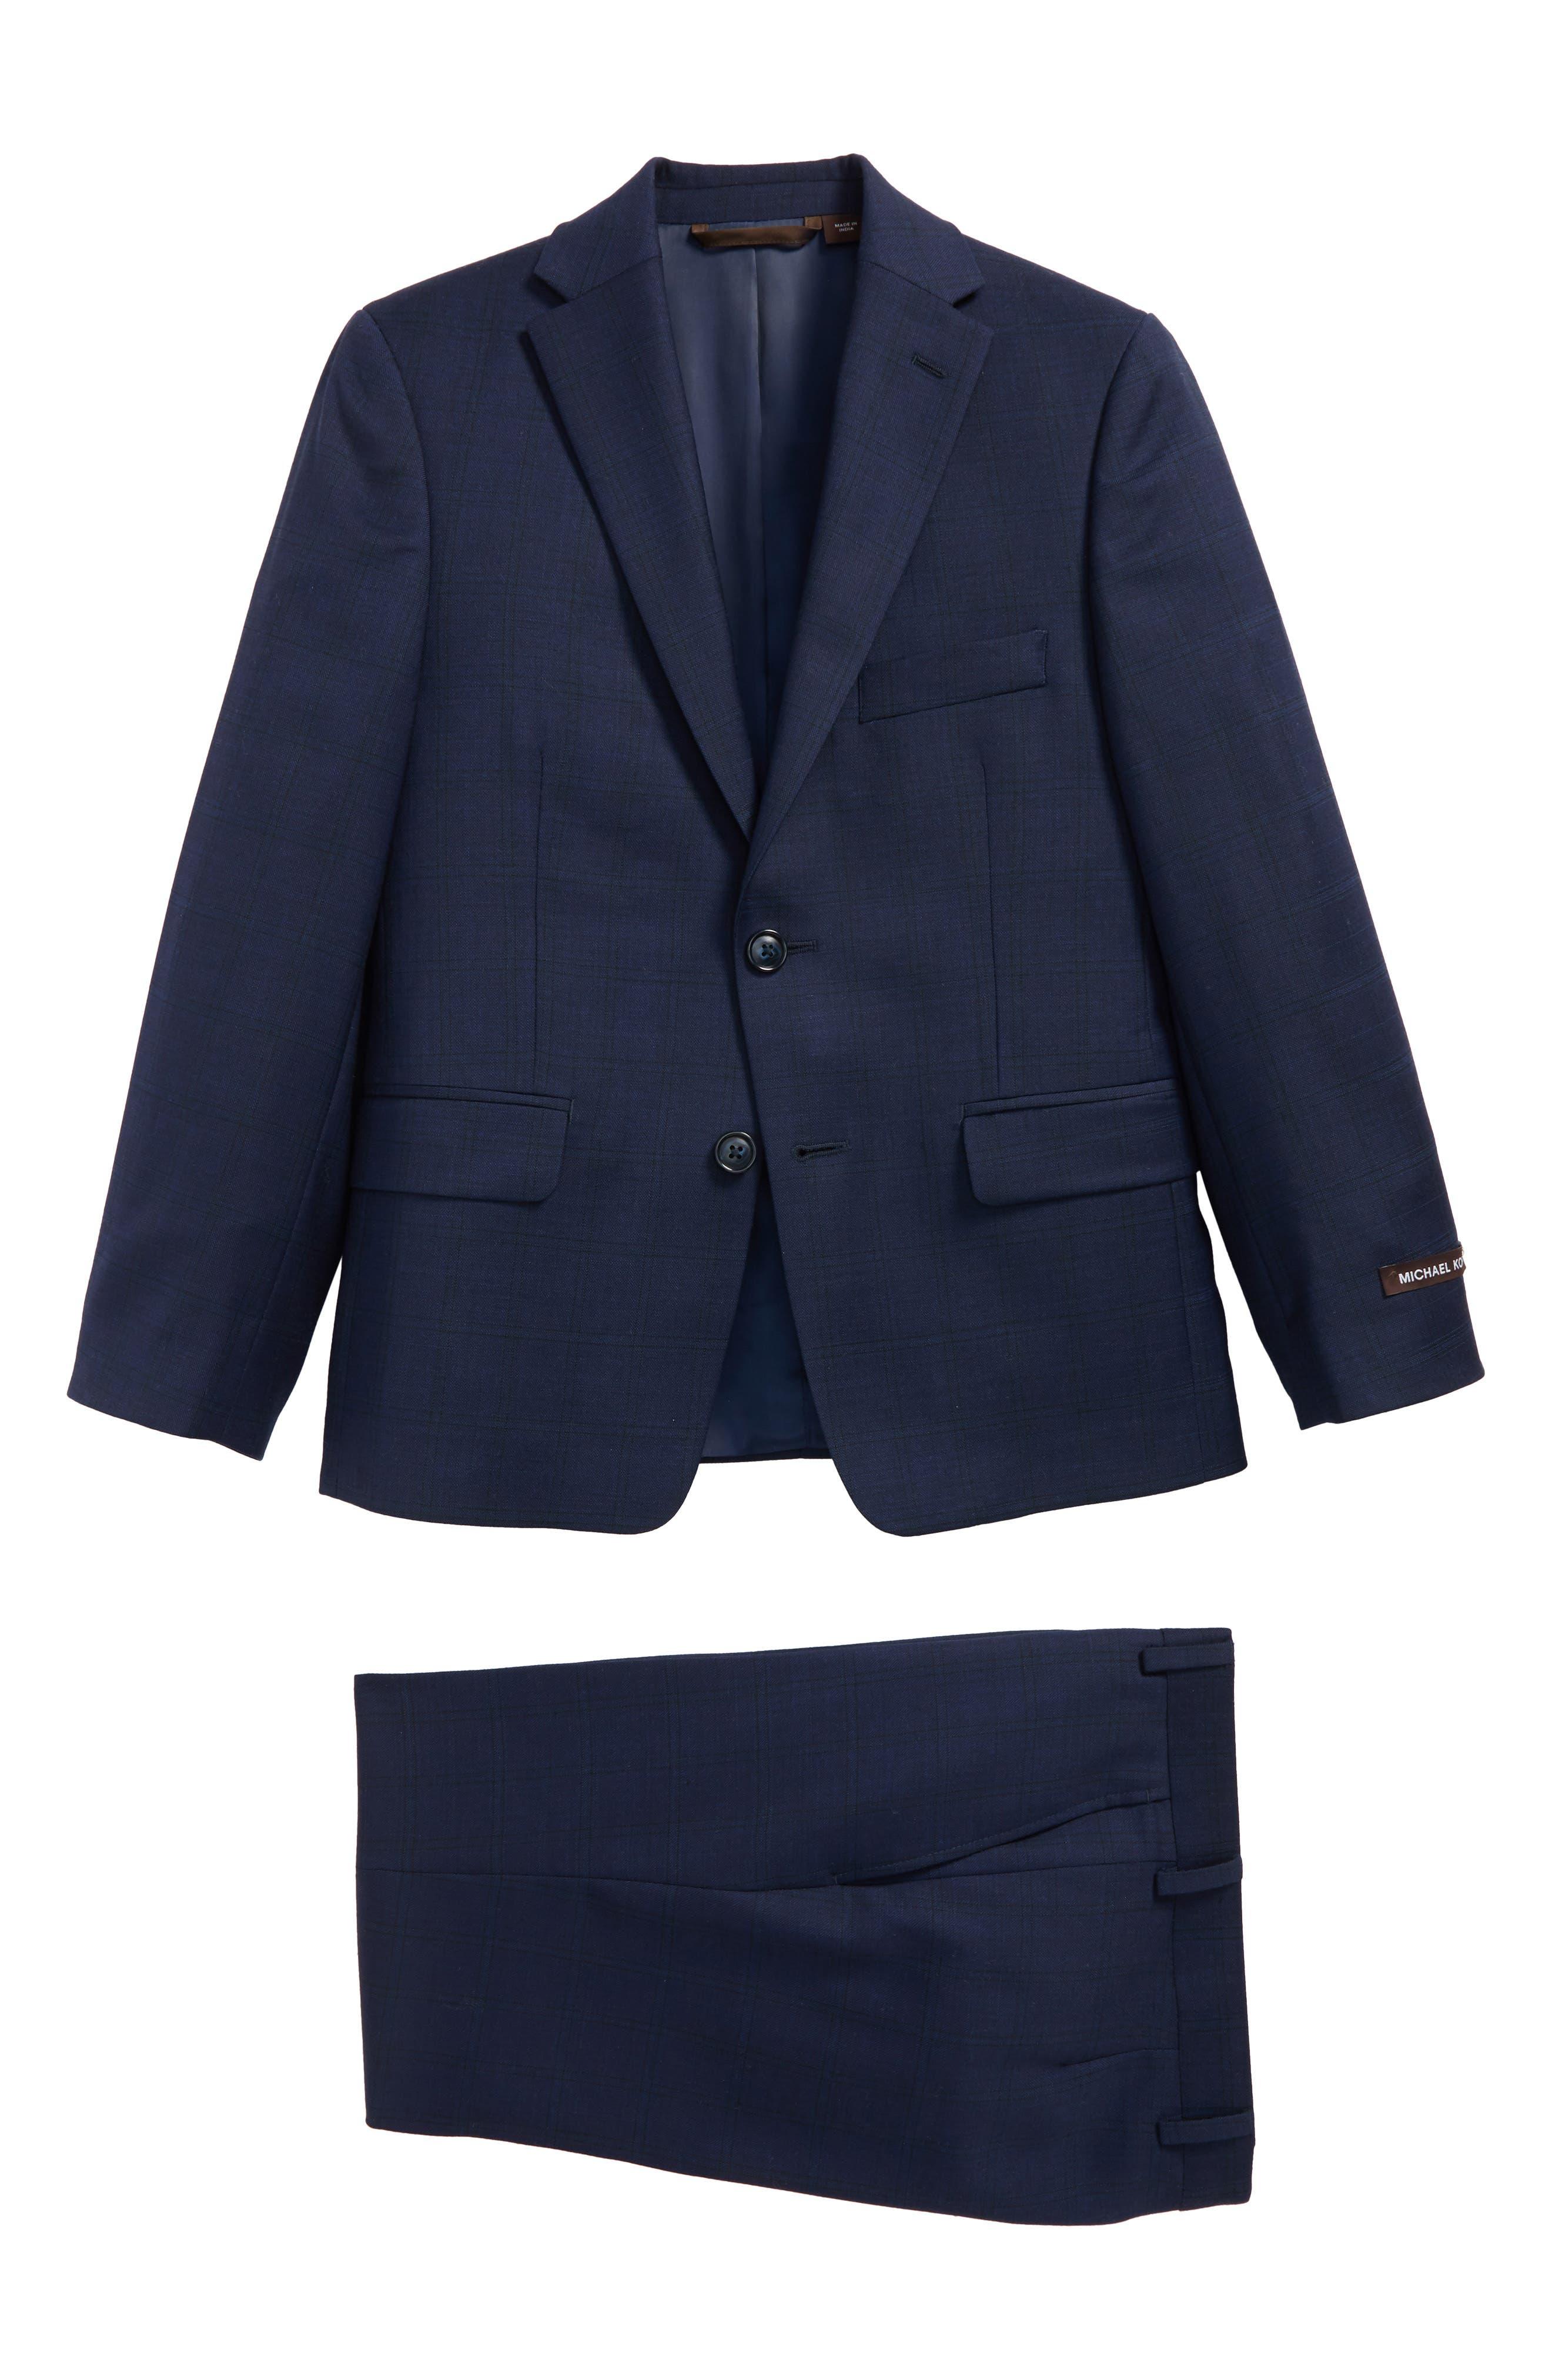 Alternate Image 1 Selected - Michael Kors Plaid Wool Suit (Big Boys)